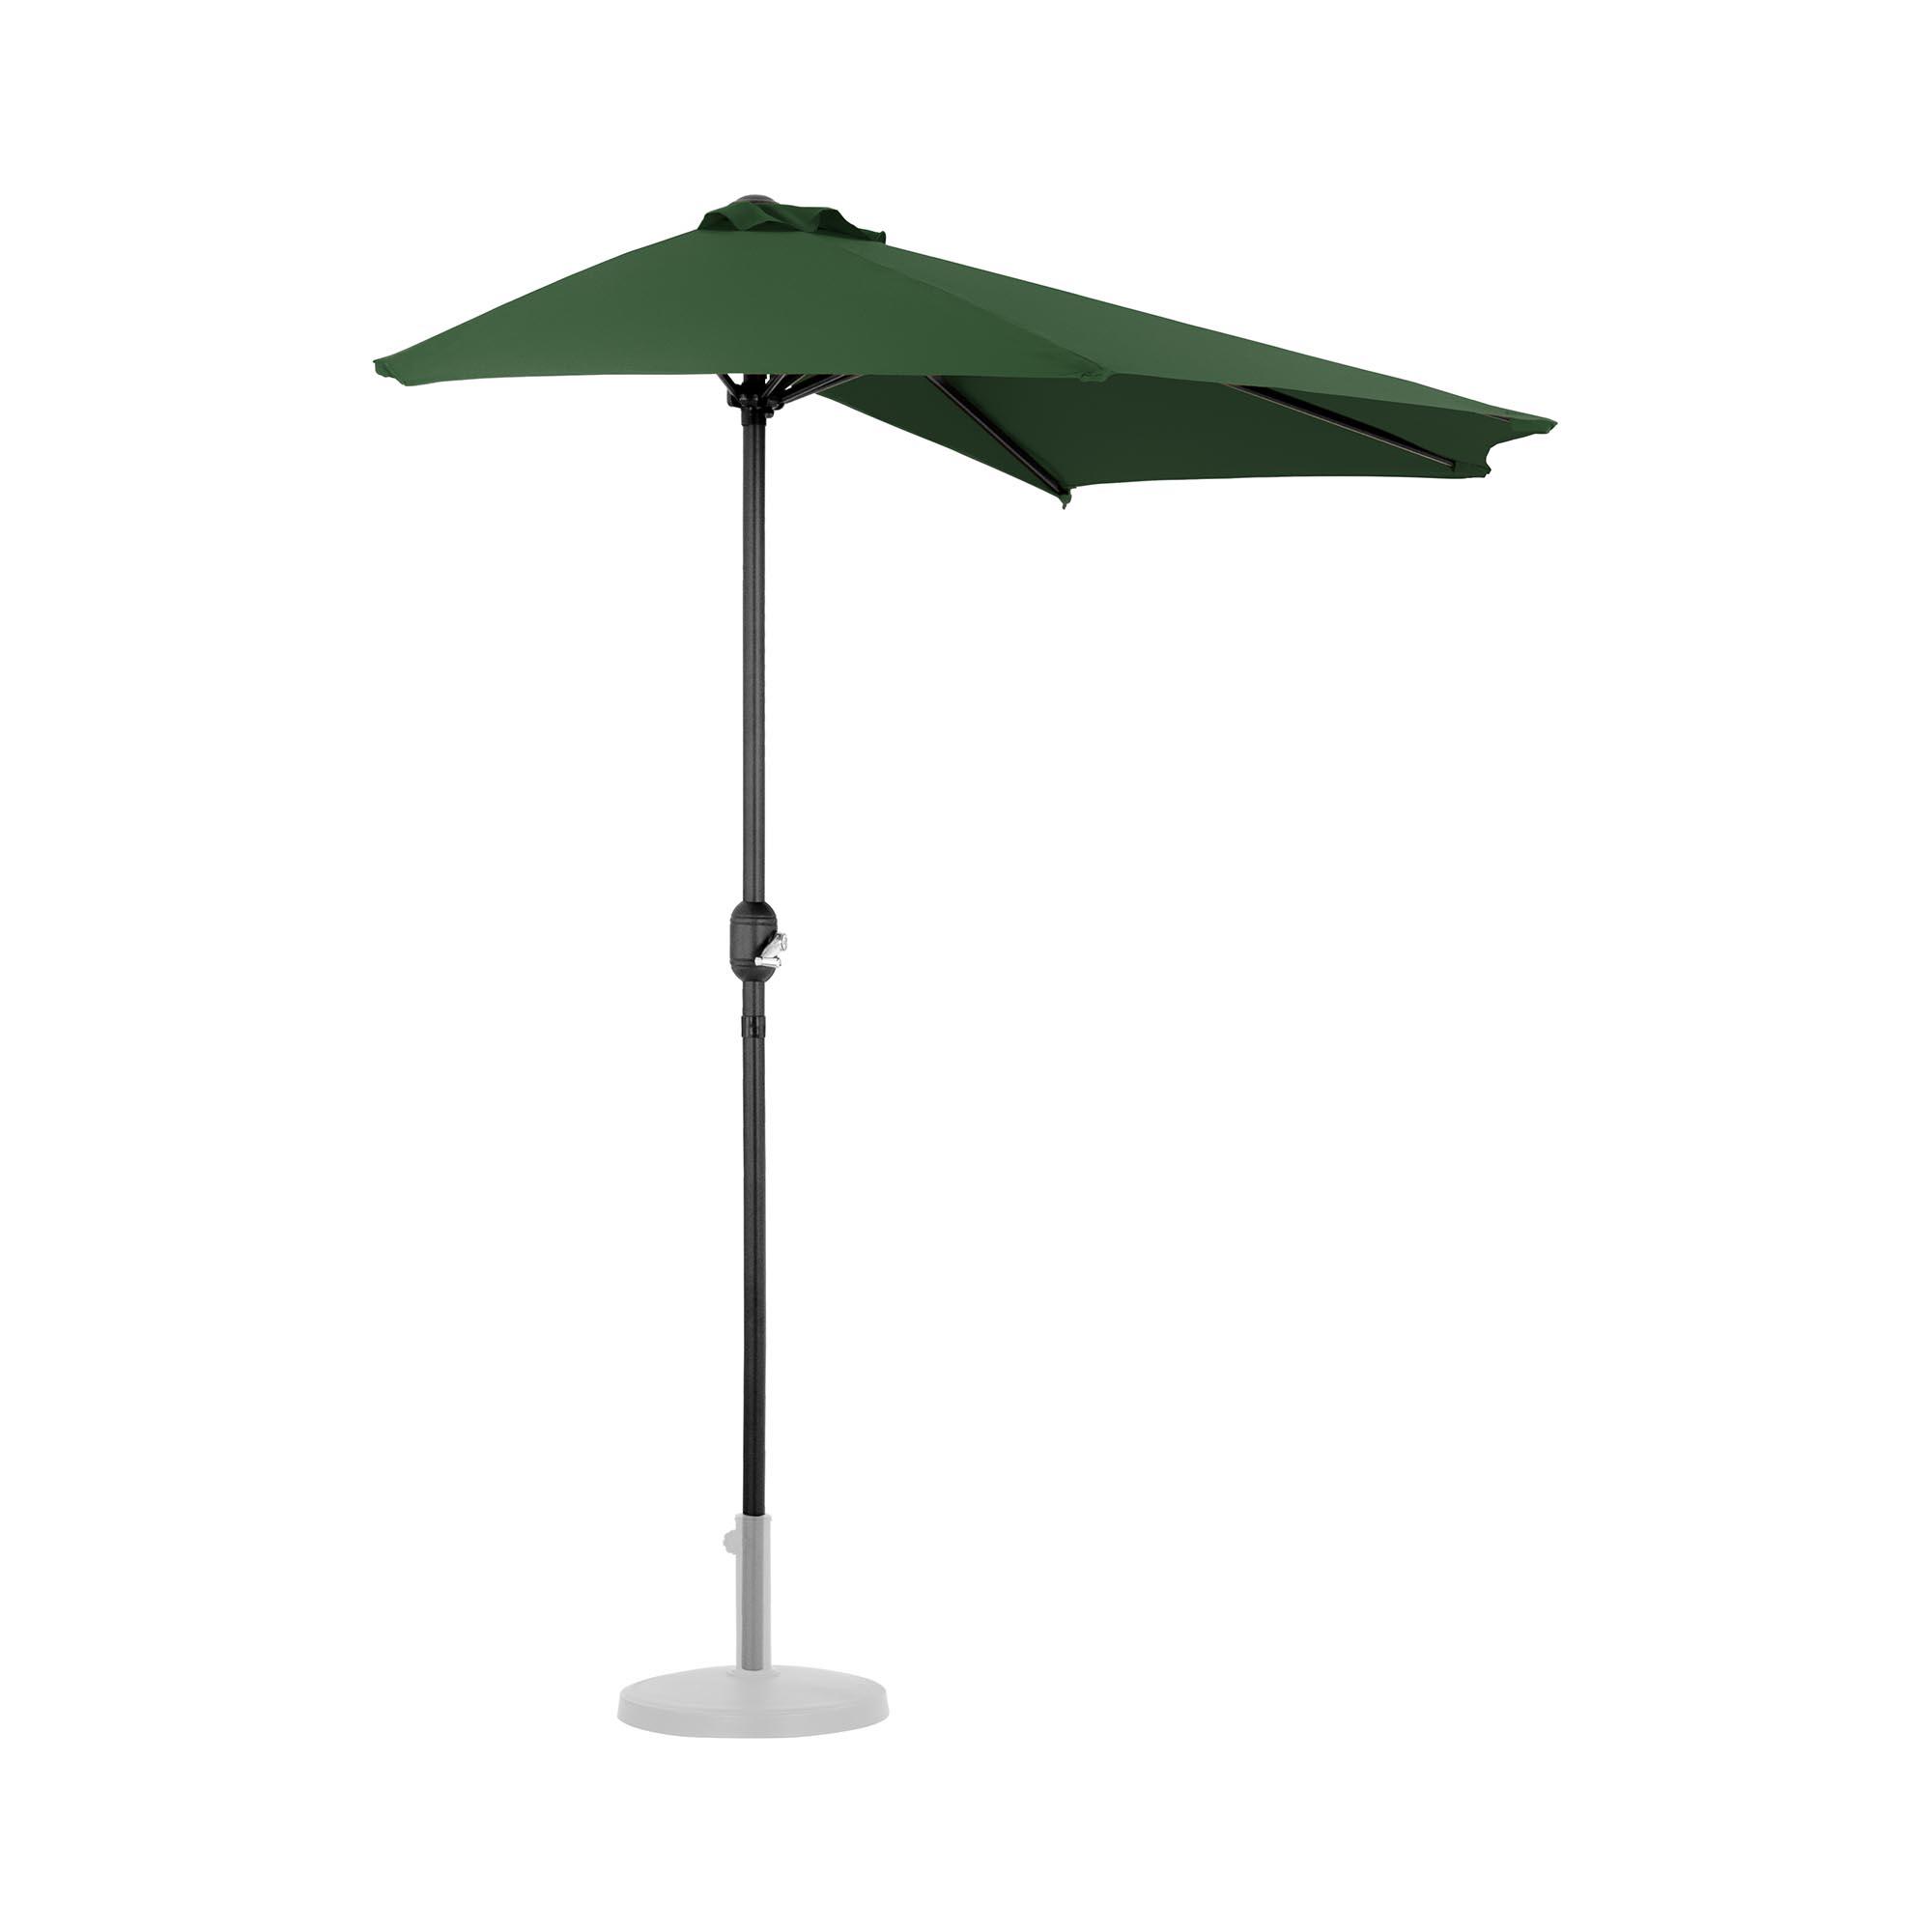 Uniprodo Halber Sonnenschirm - Grün - fünfeckig - 270 x 135 cm UNI_HALFUMBRELLA_R300GR